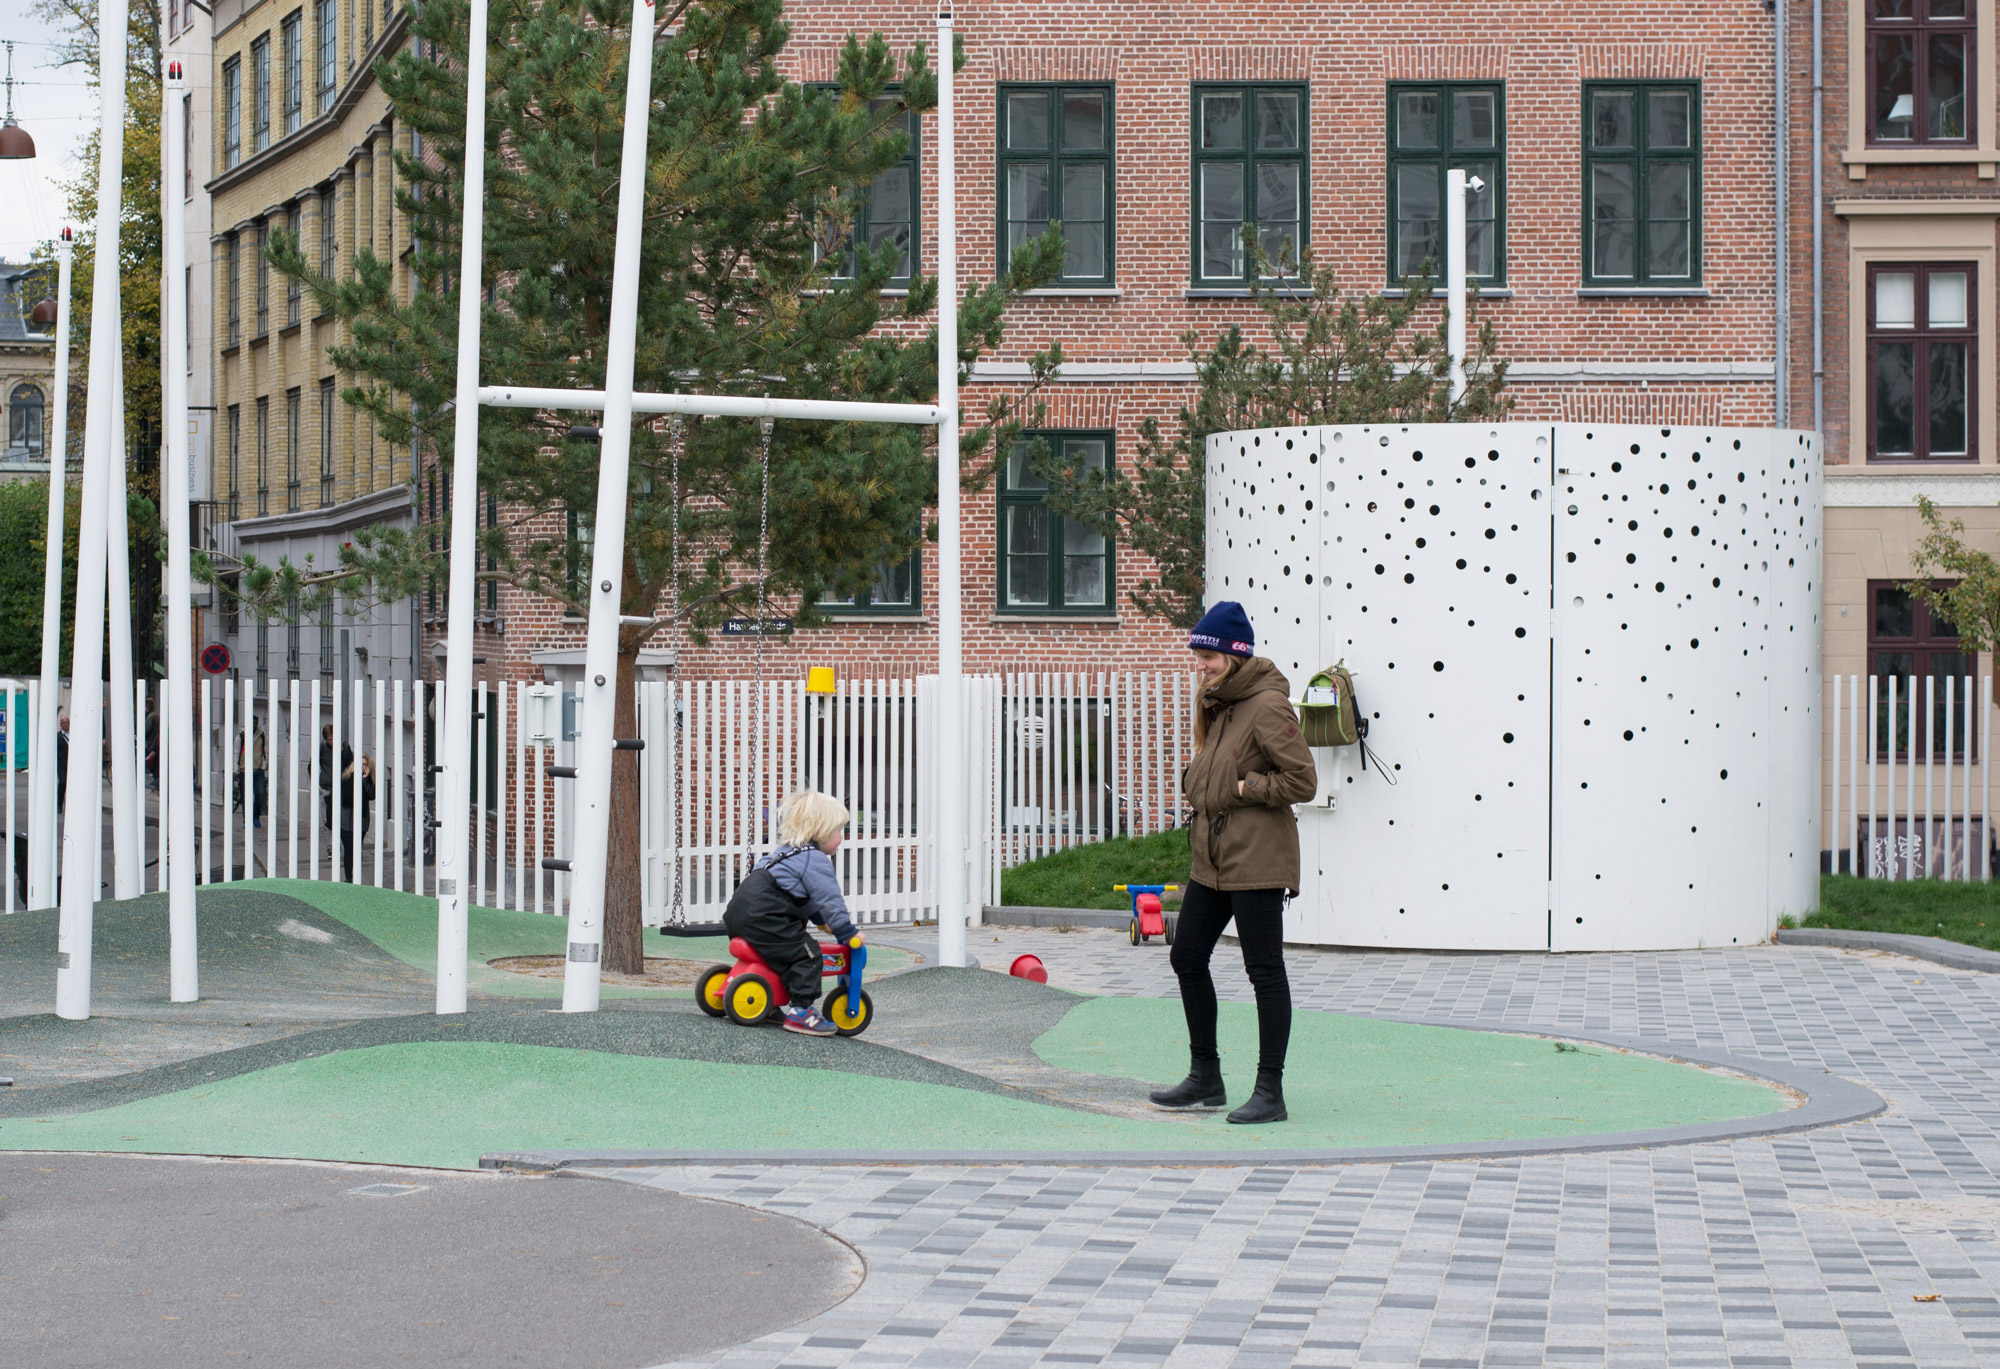 urbanbacklog-copenhagen-hauser-plads-6.jpg